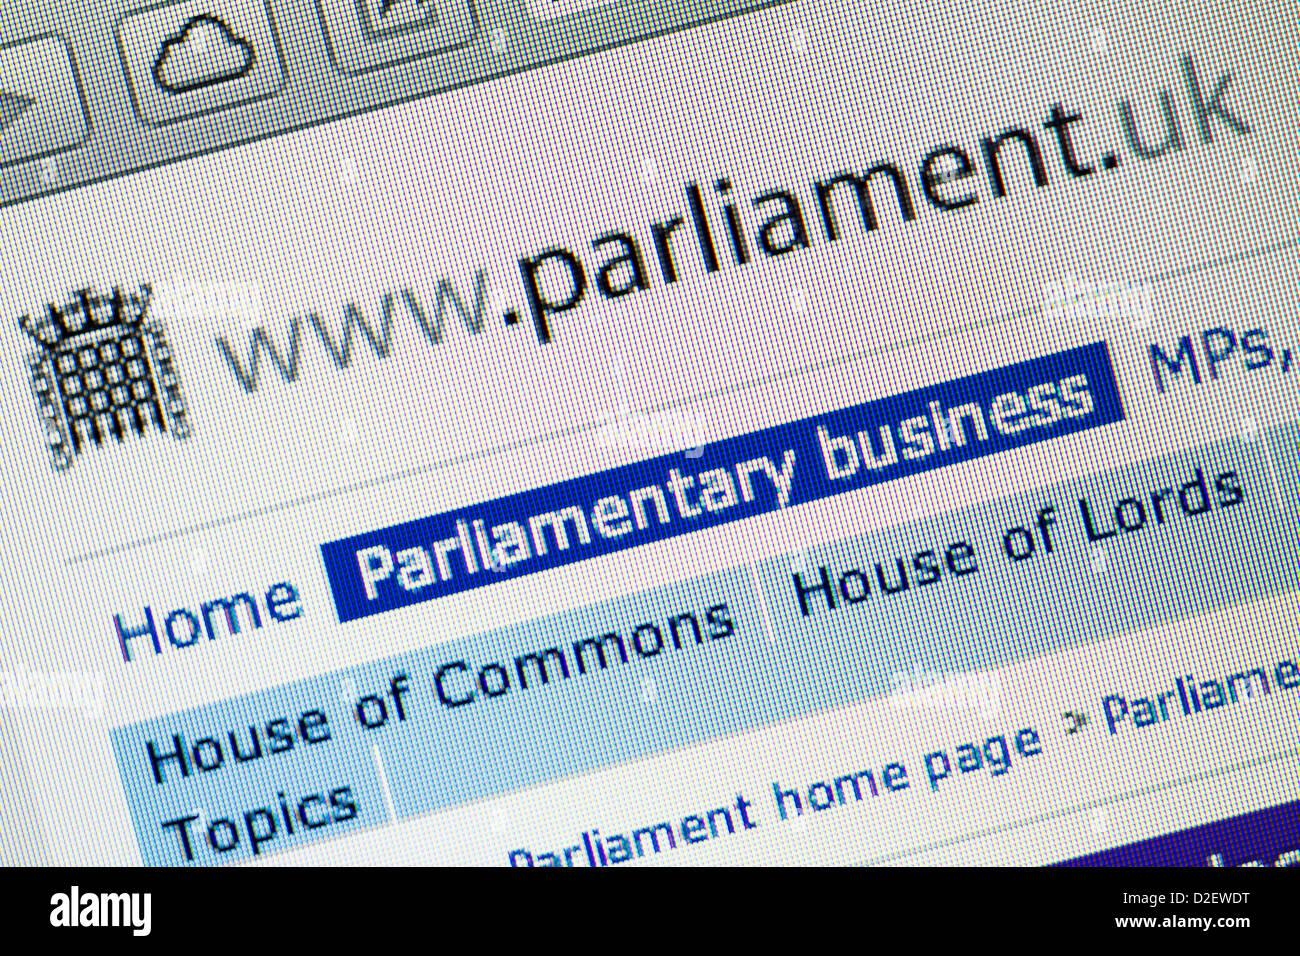 Parliament logo and website close up - Stock Image